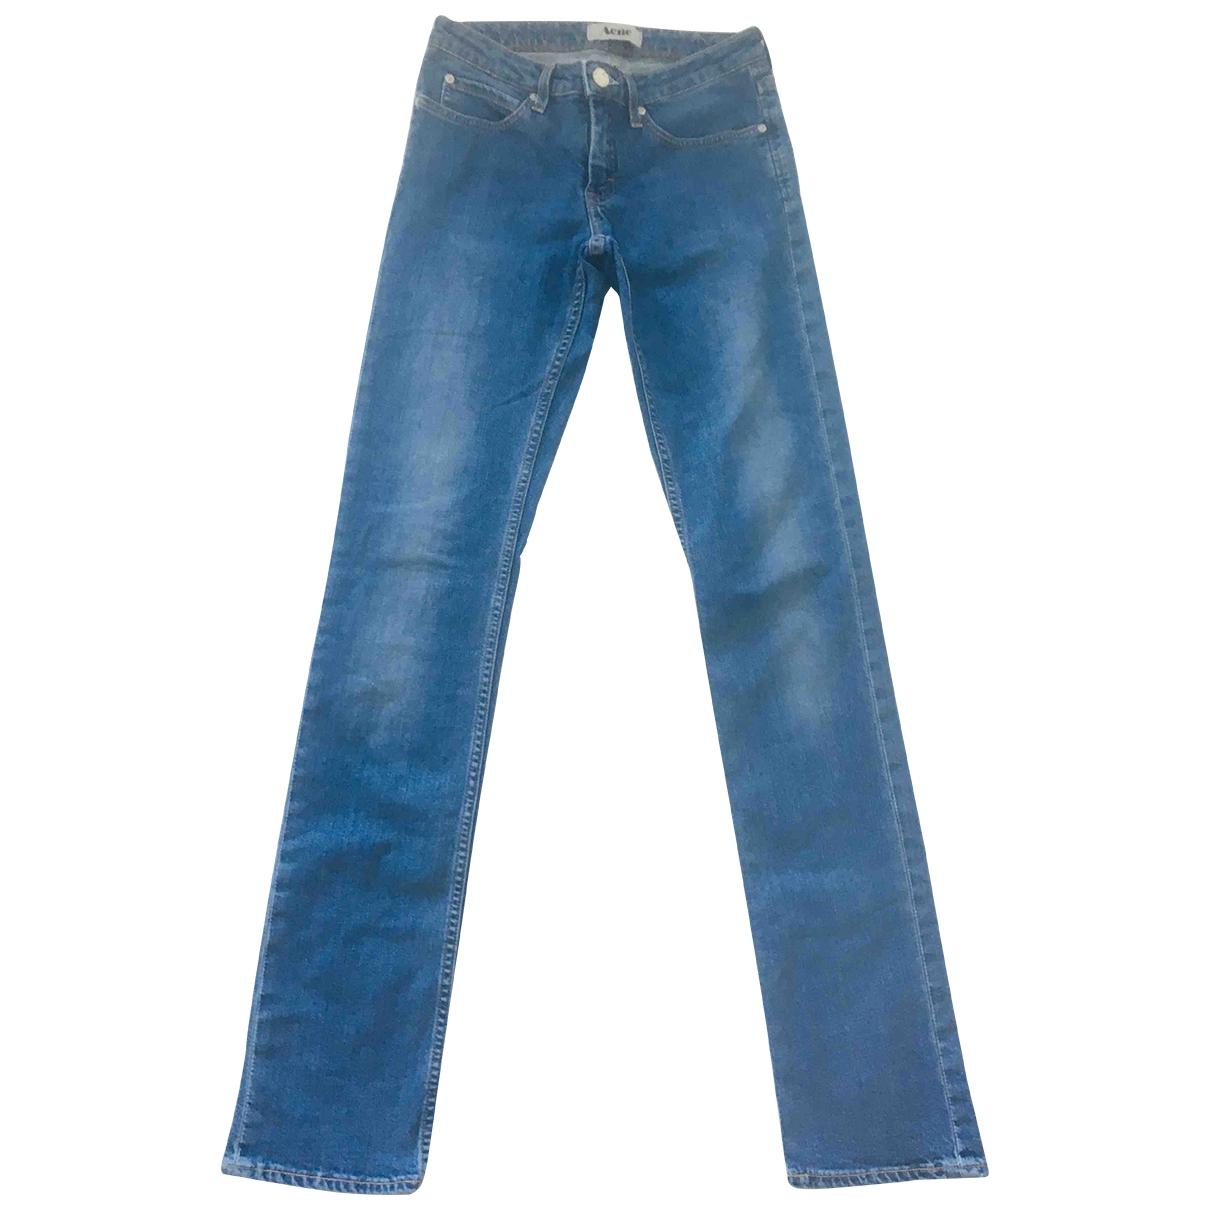 Acne Studios \N Blue Cotton - elasthane Jeans for Women 27 US